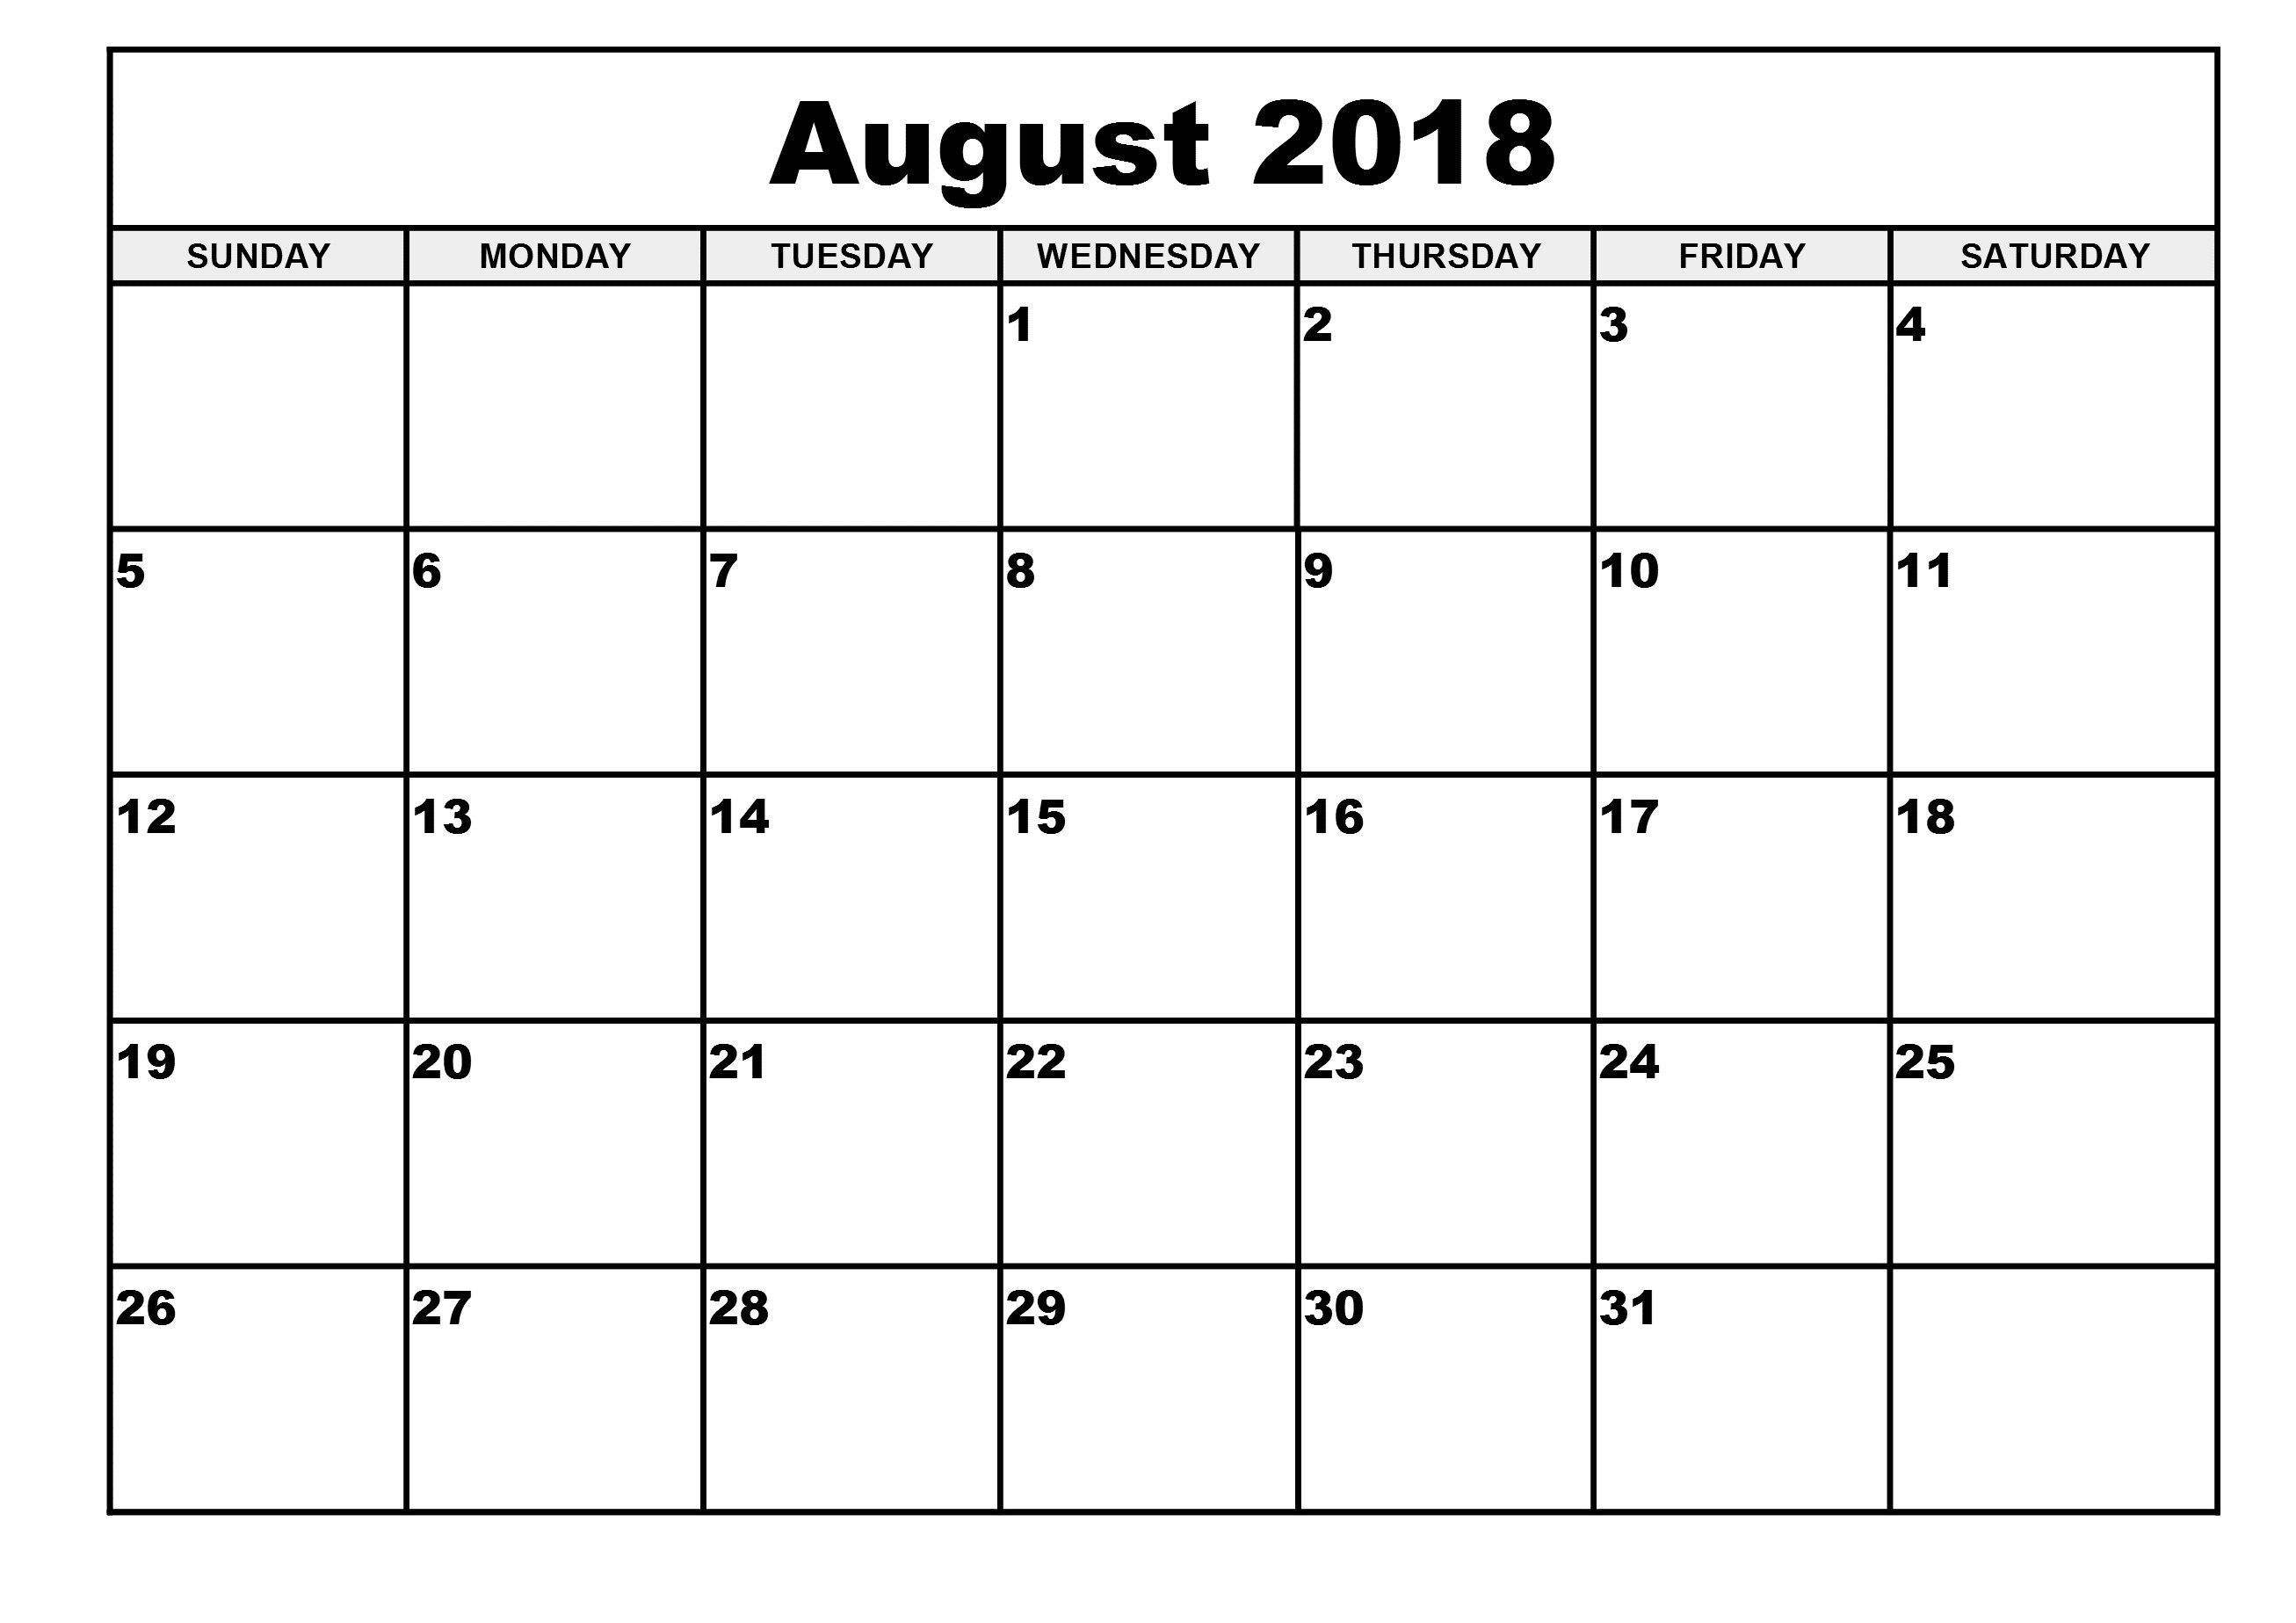 Pin4Khd On August 2018 Calendar Printable | November Calendar within August Blank Calendar Printable